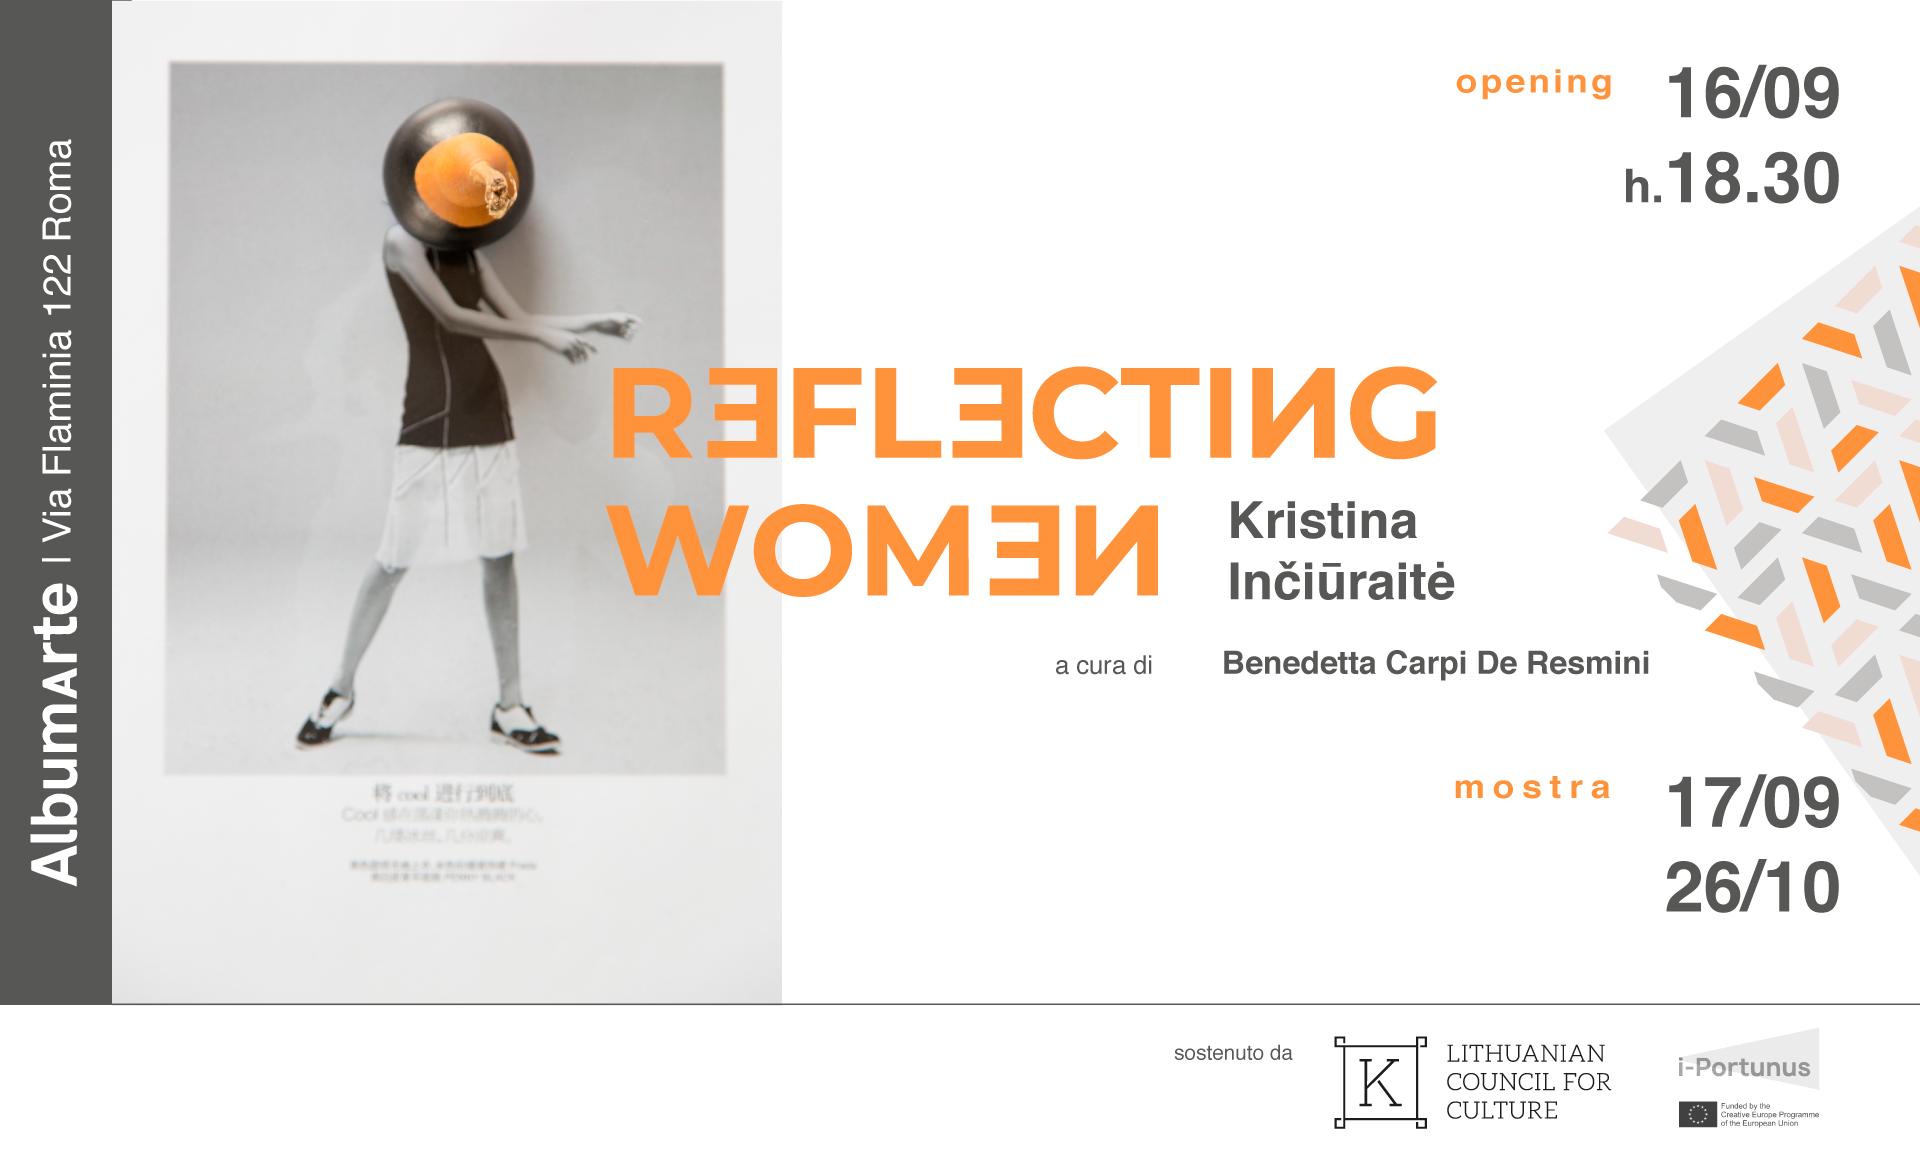 Reflecting Women_ Albumarte_Latitudo ITA